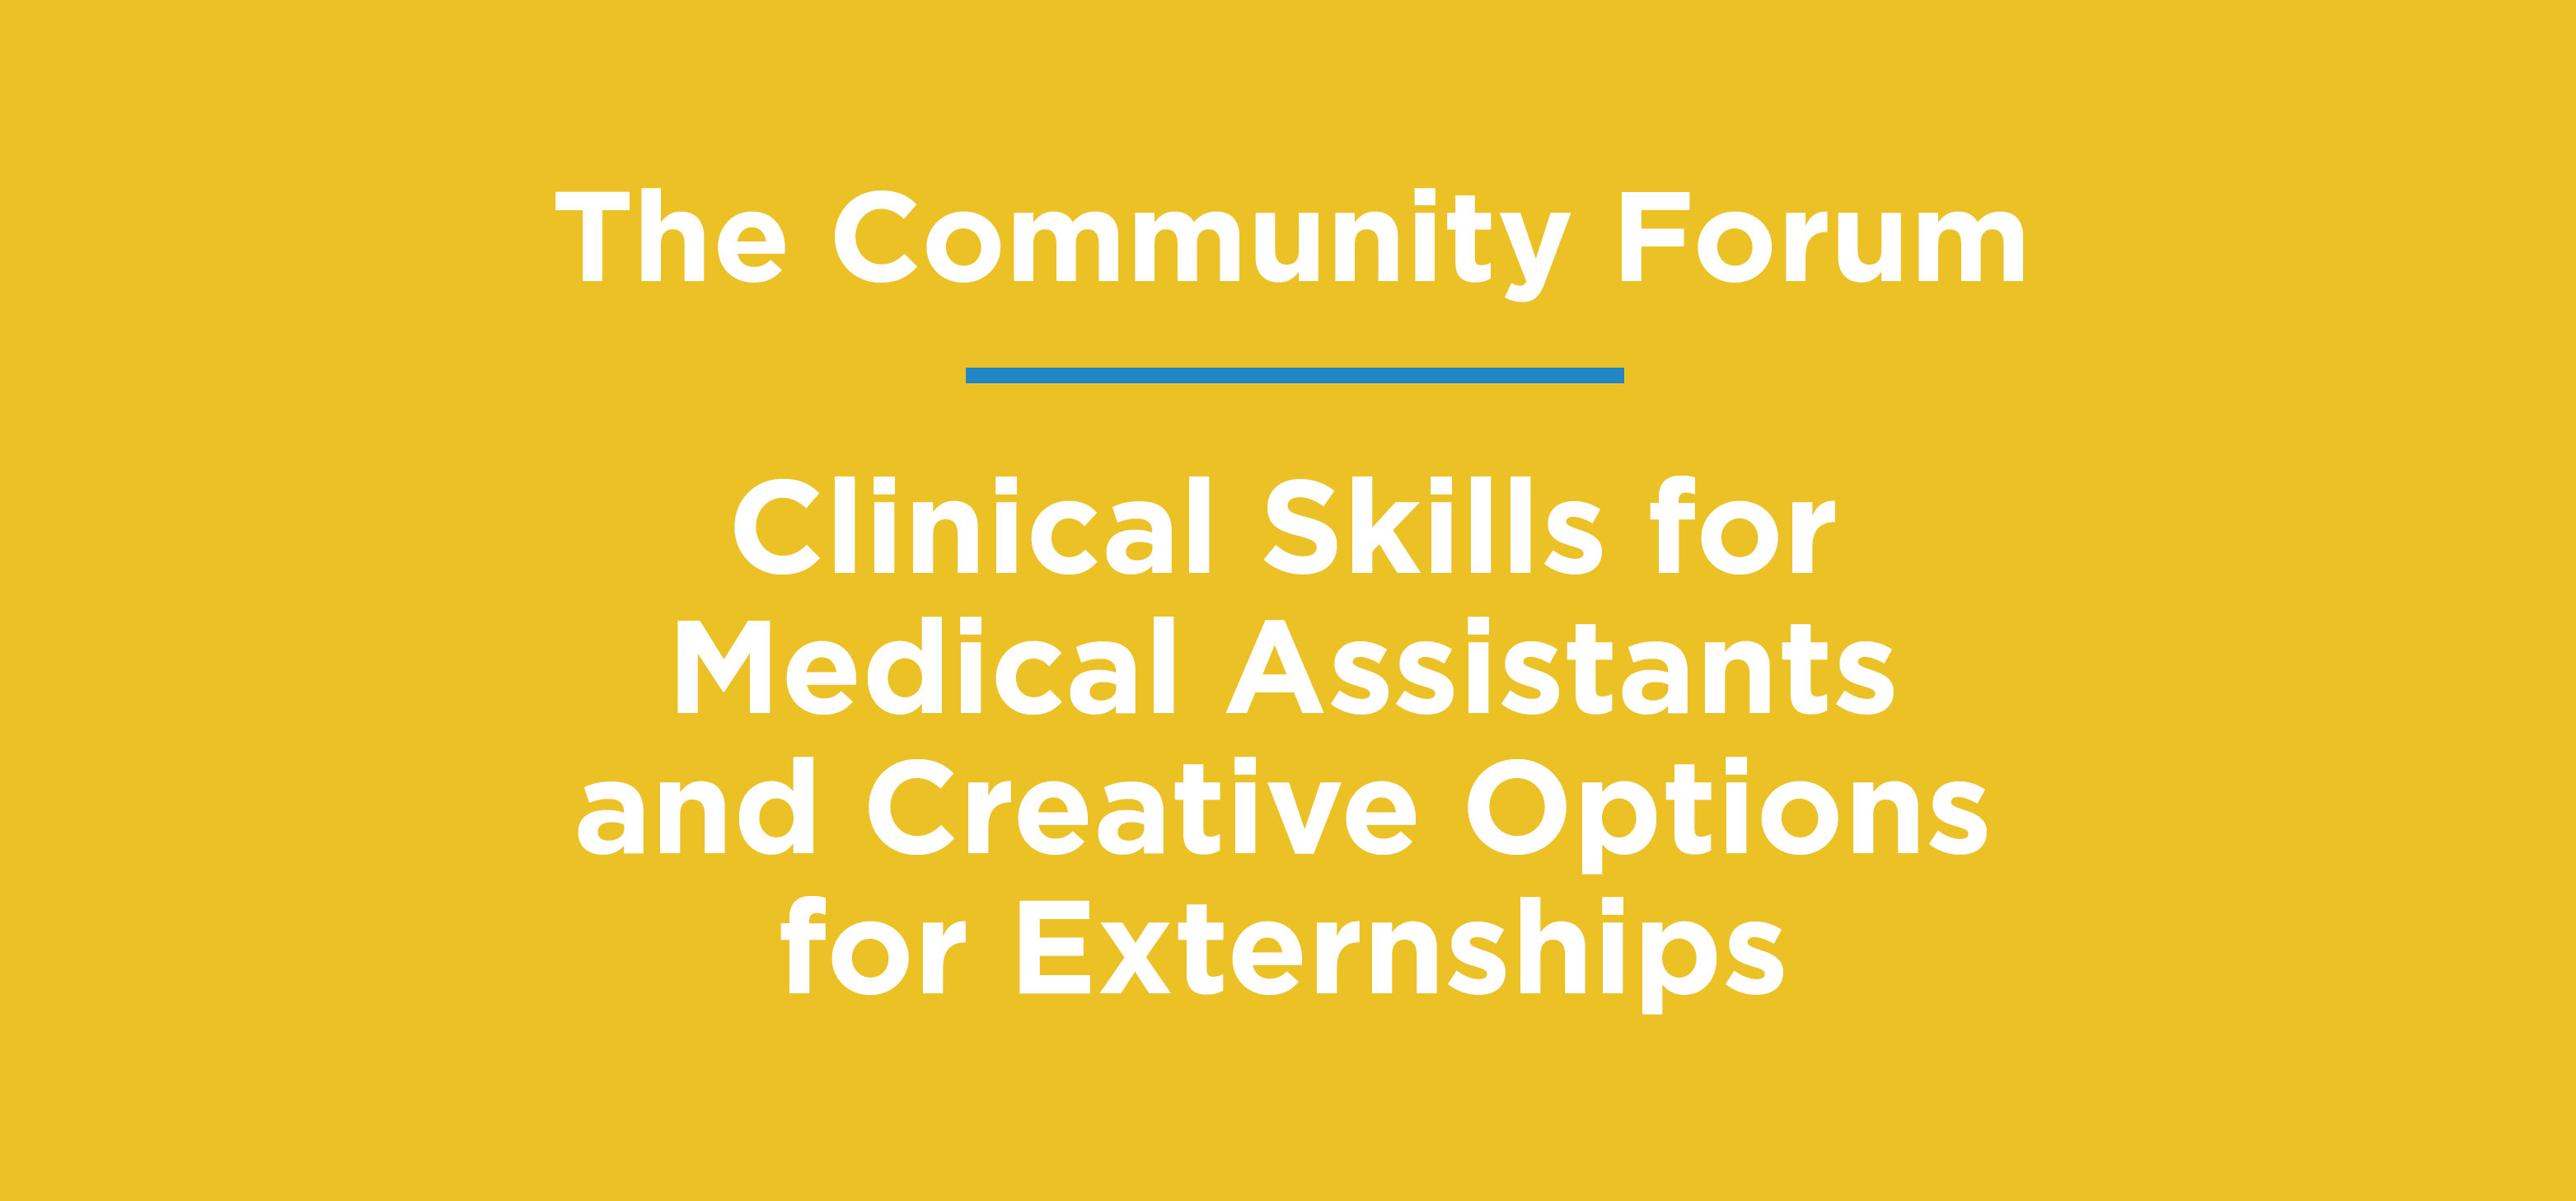 medical-assistants-and-externships